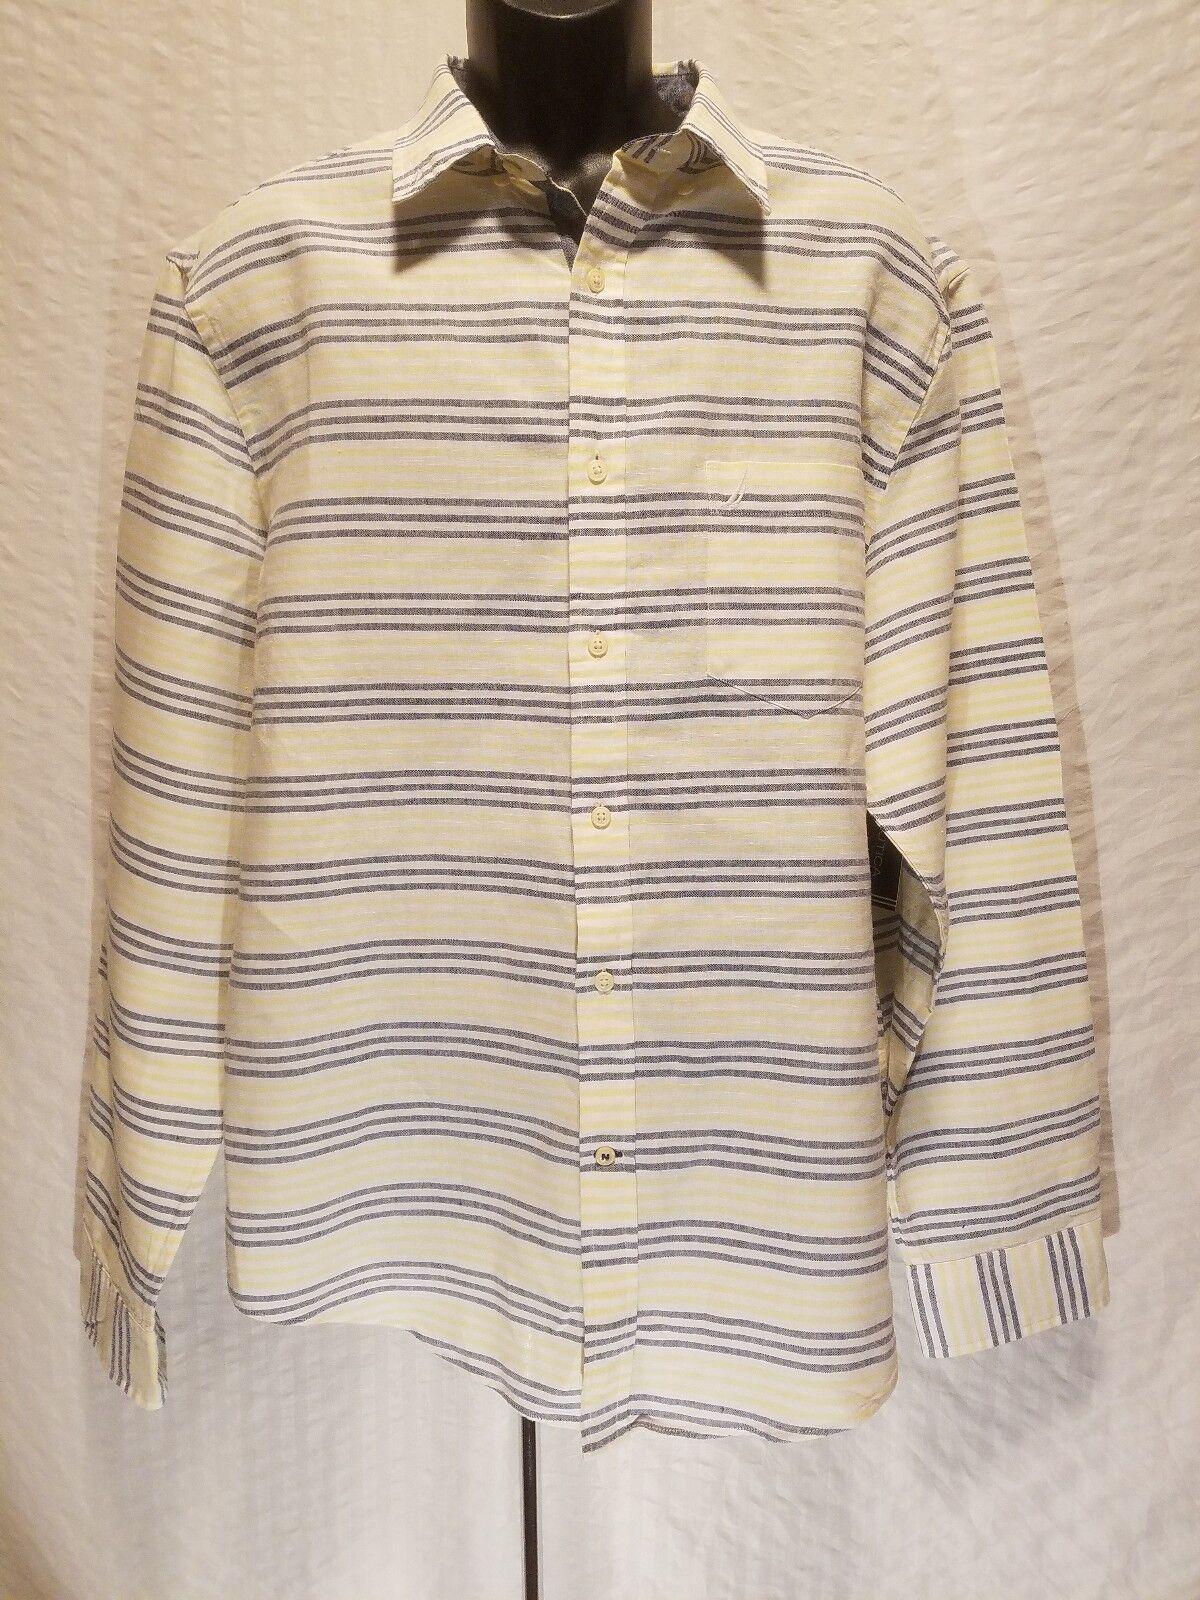 New NAUTICA Men's XL XLarge Linen Button Long Sleeve White Striped Shirt